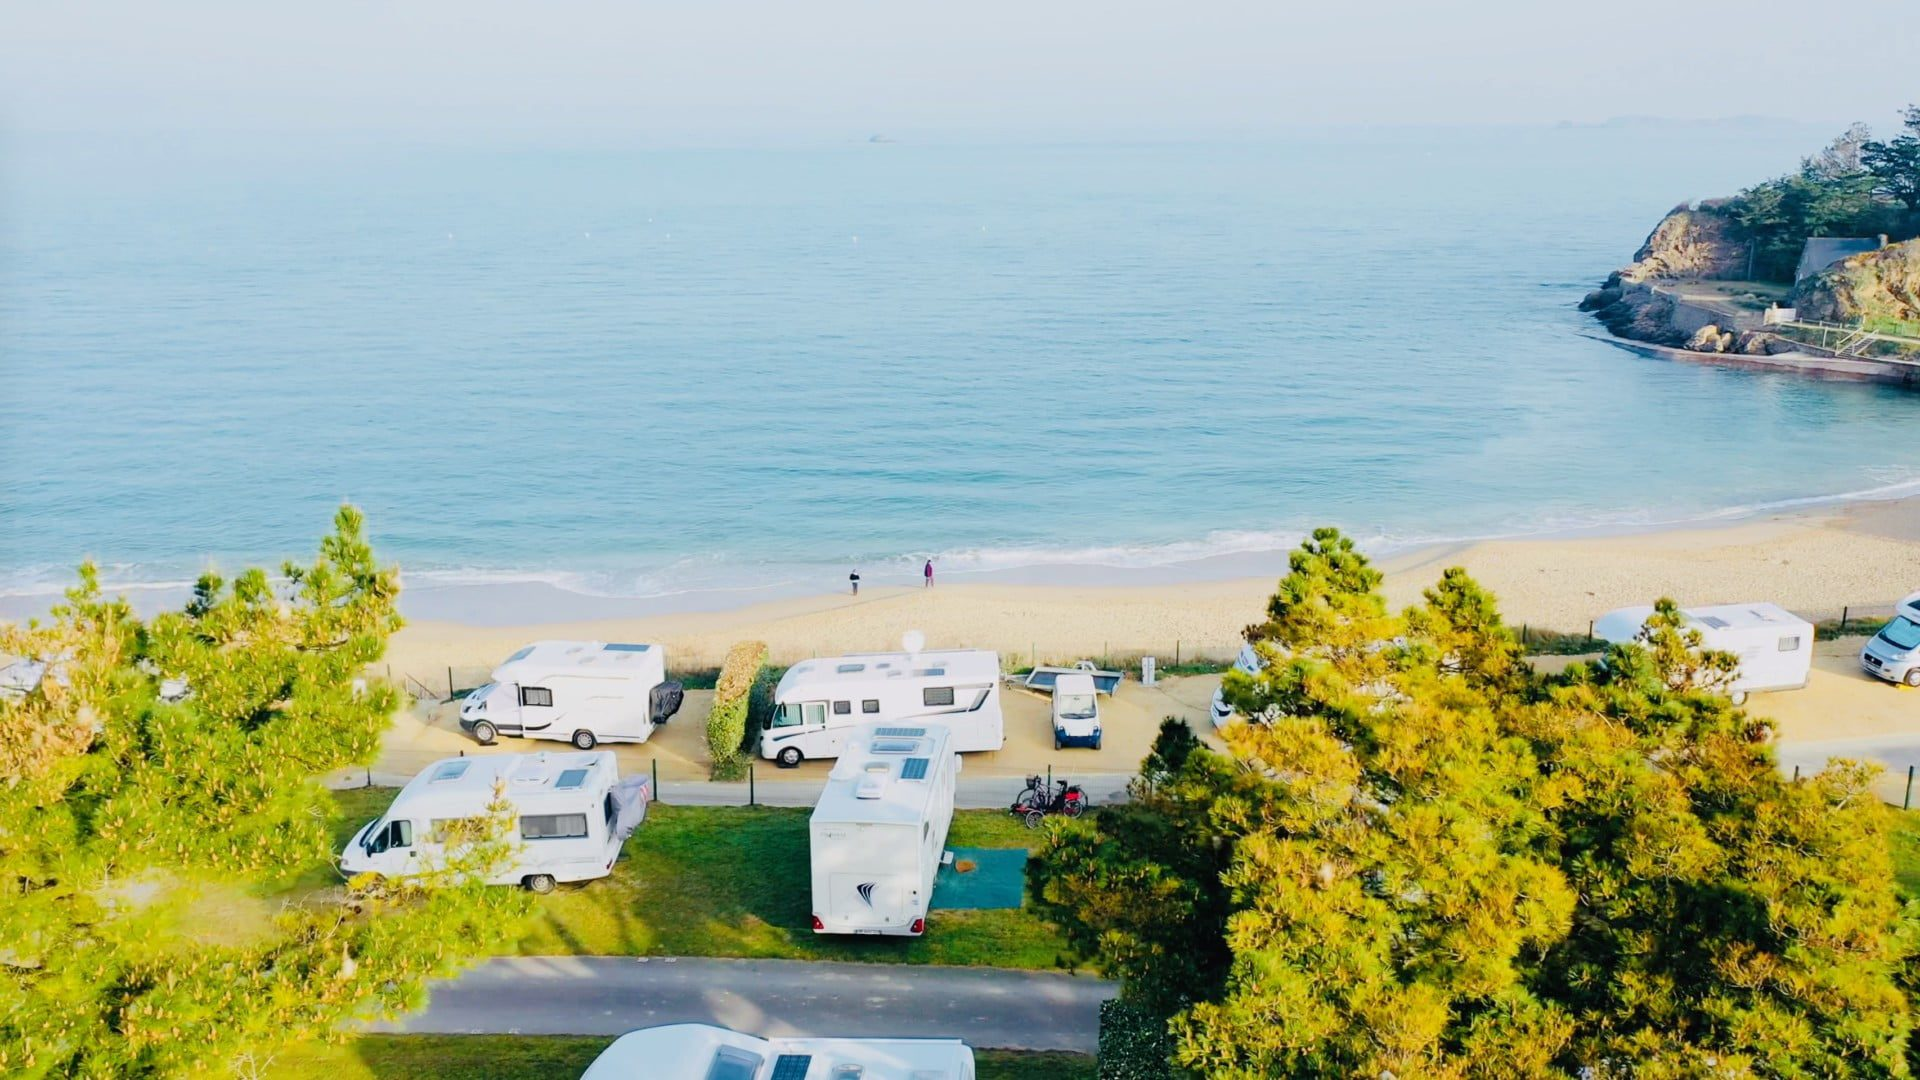 Camping-Port-Blanc-DINARD-Vue-Mer-vacances-plage-nature